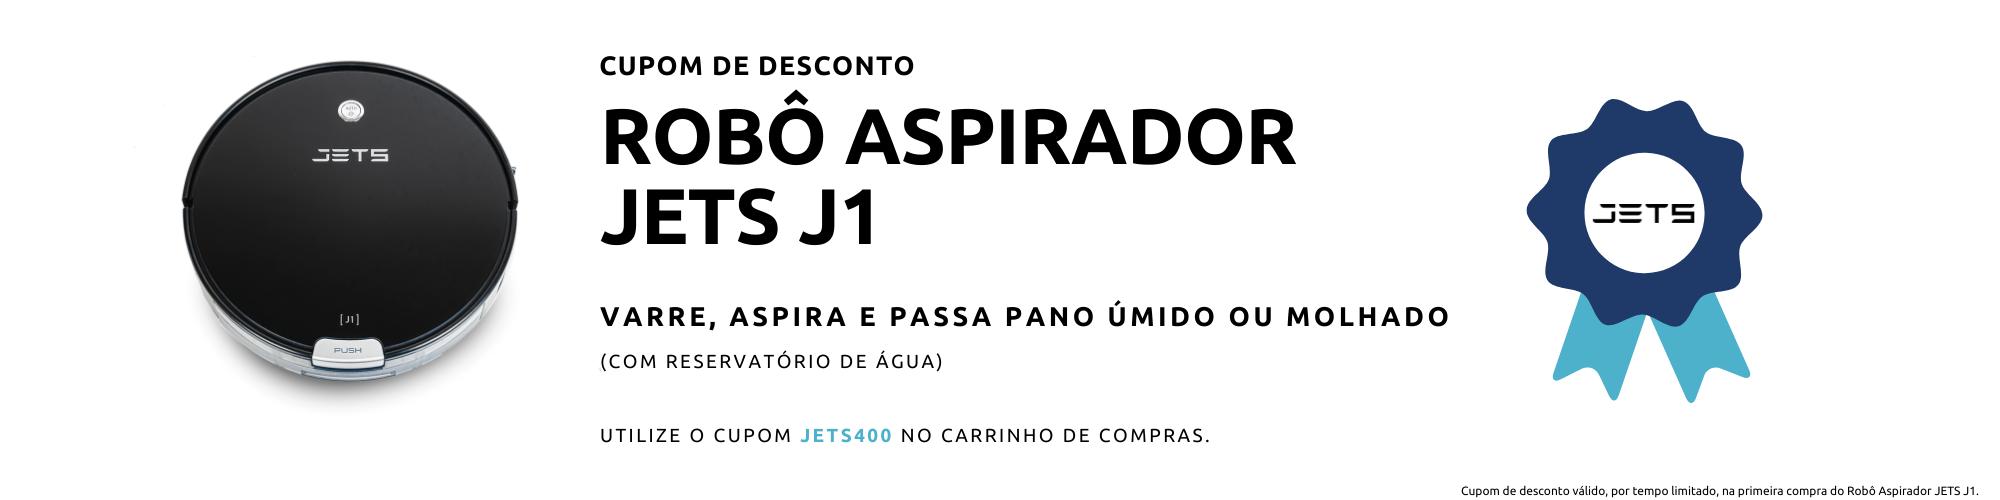 JETS J1 - CUPOM JETS400